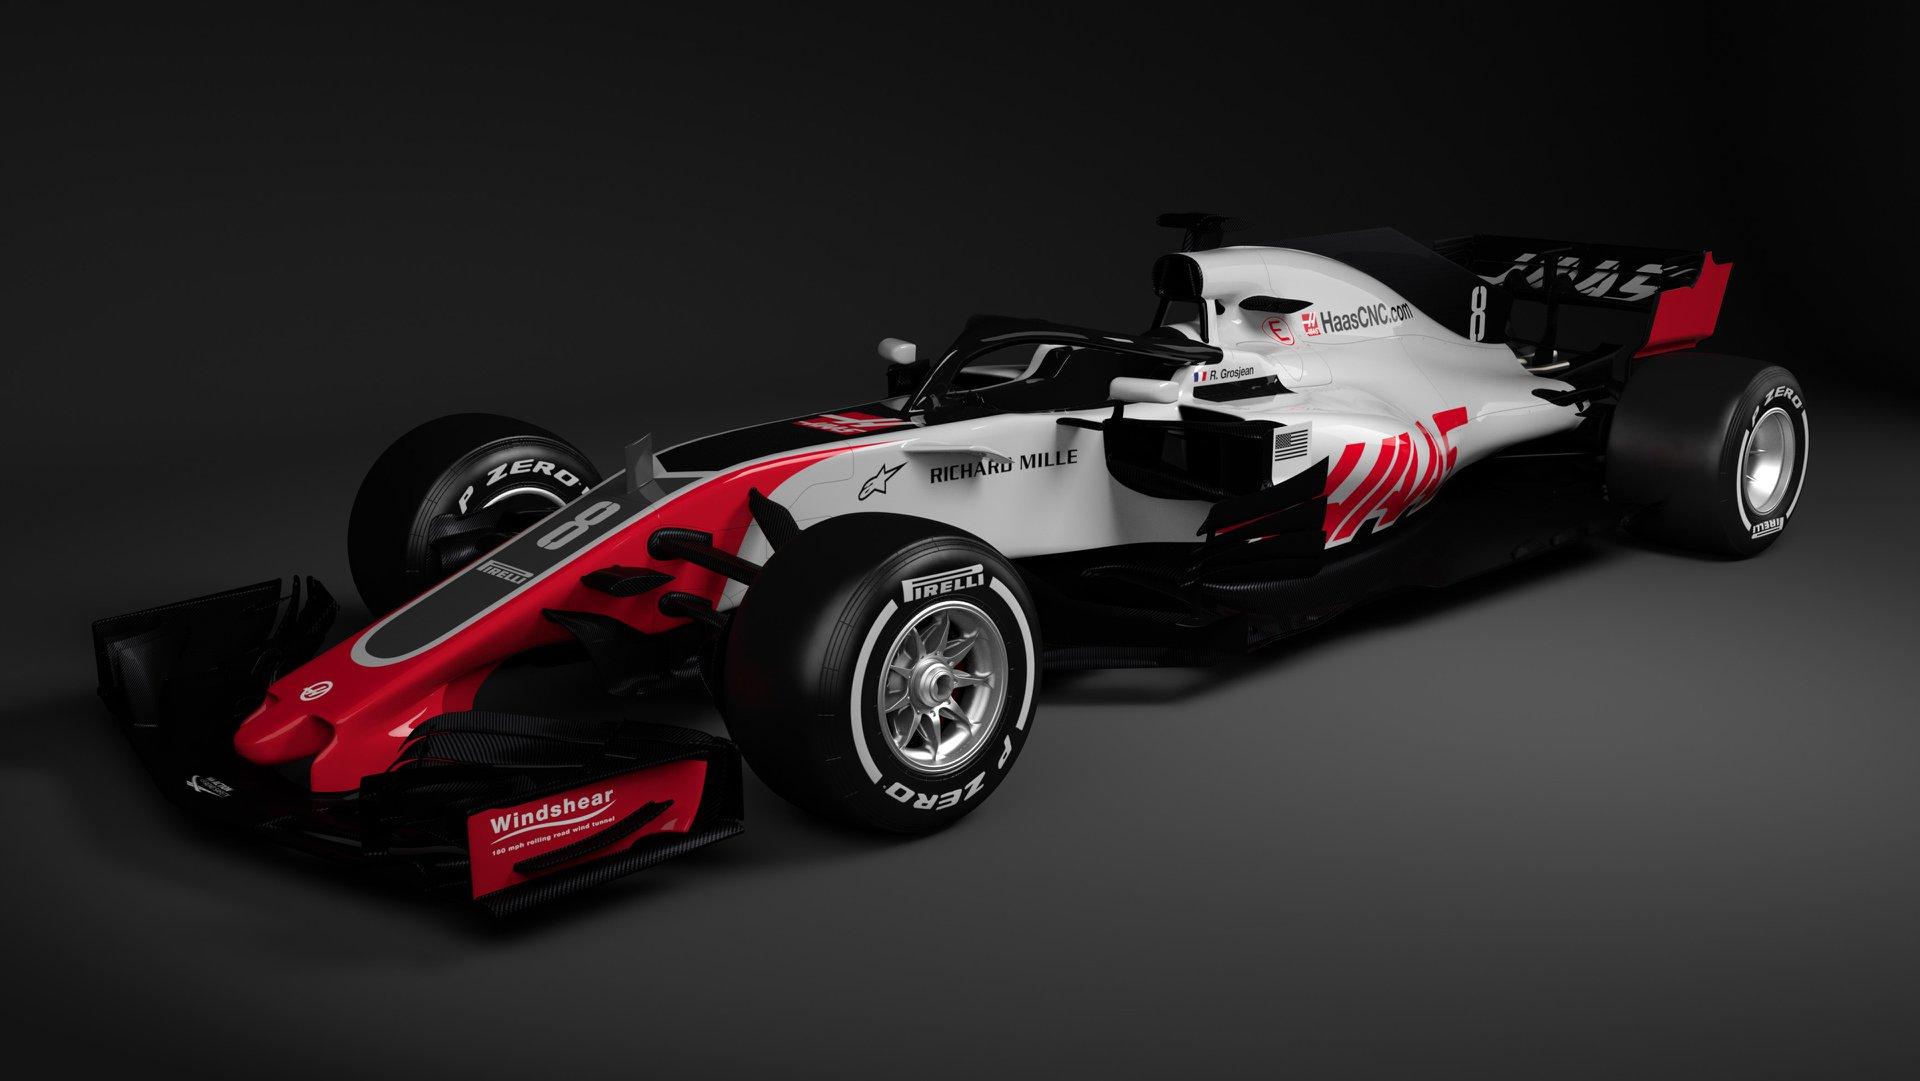 2018 Haas F1 New Car 2.jpg